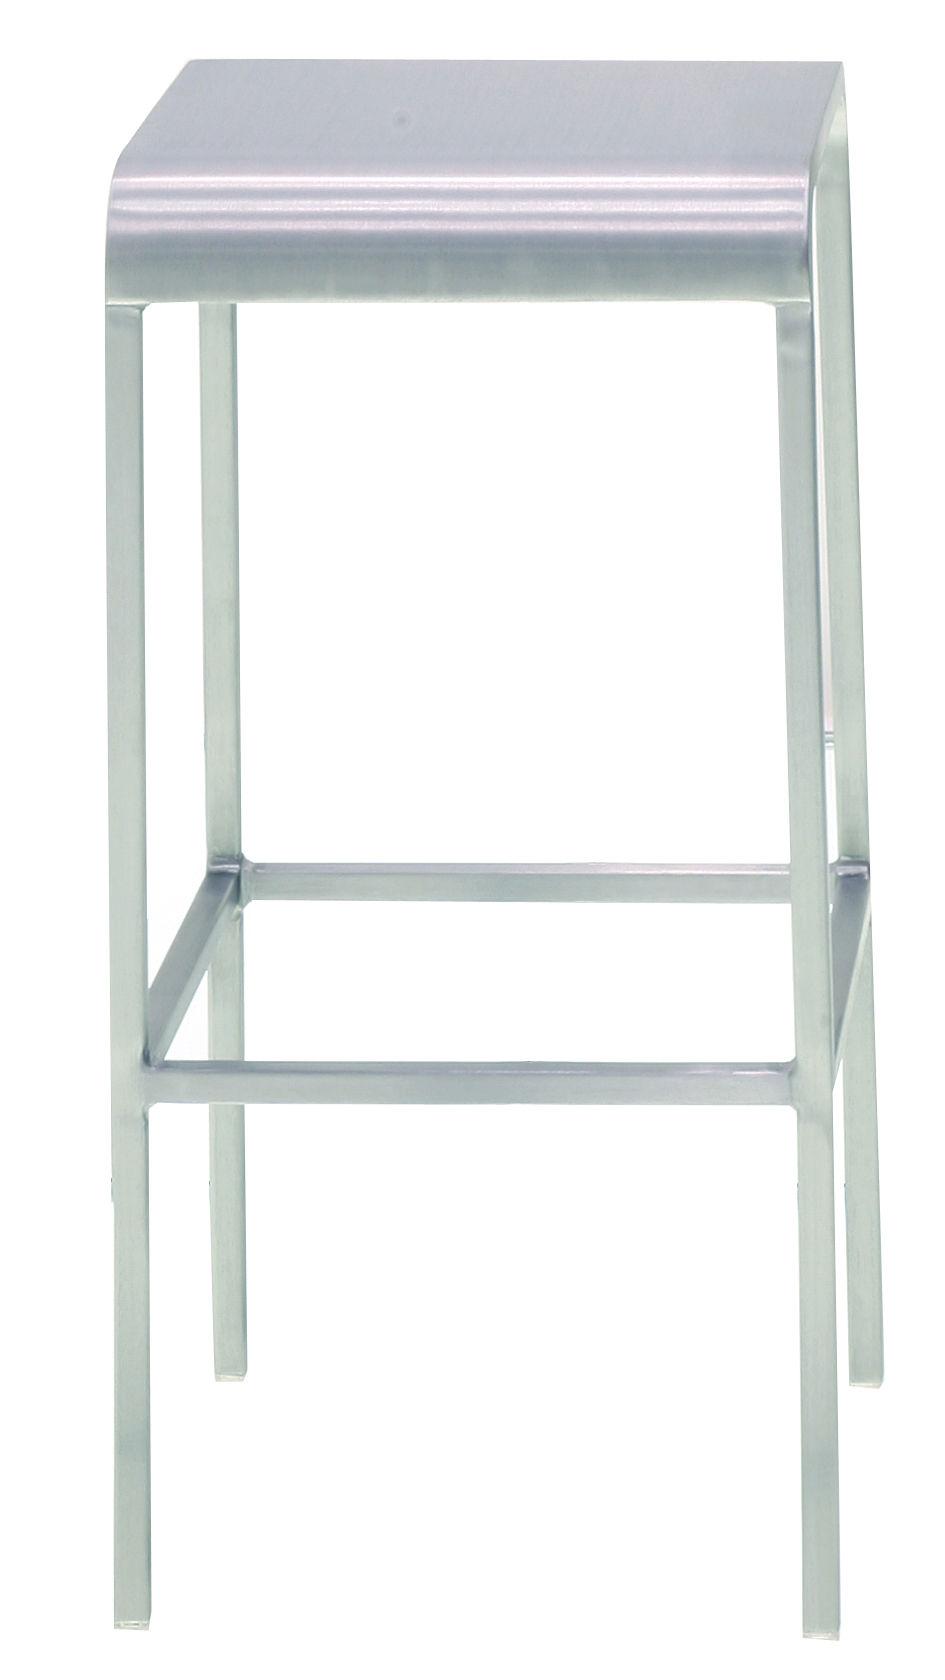 Mobilier - Tabourets de bar - Tabouret de bar 20-06 / Aluminium - H 60 cm - Emeco - Aluminium mat - Aluminium